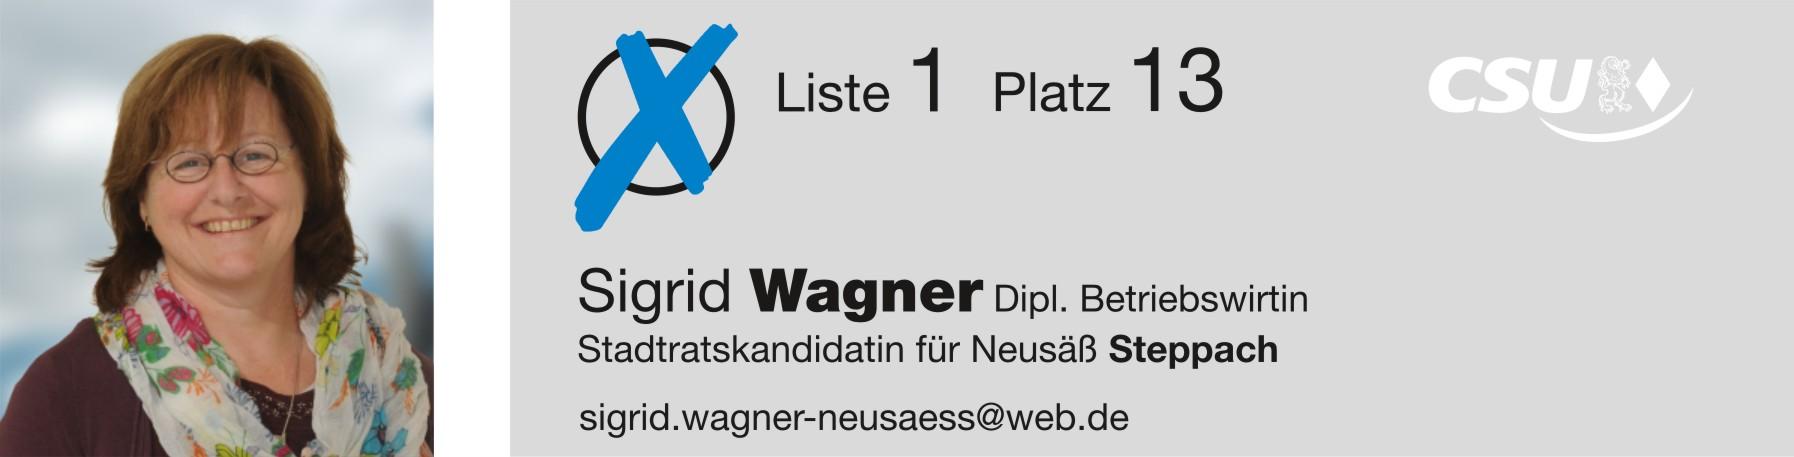 Wagner Platz 13